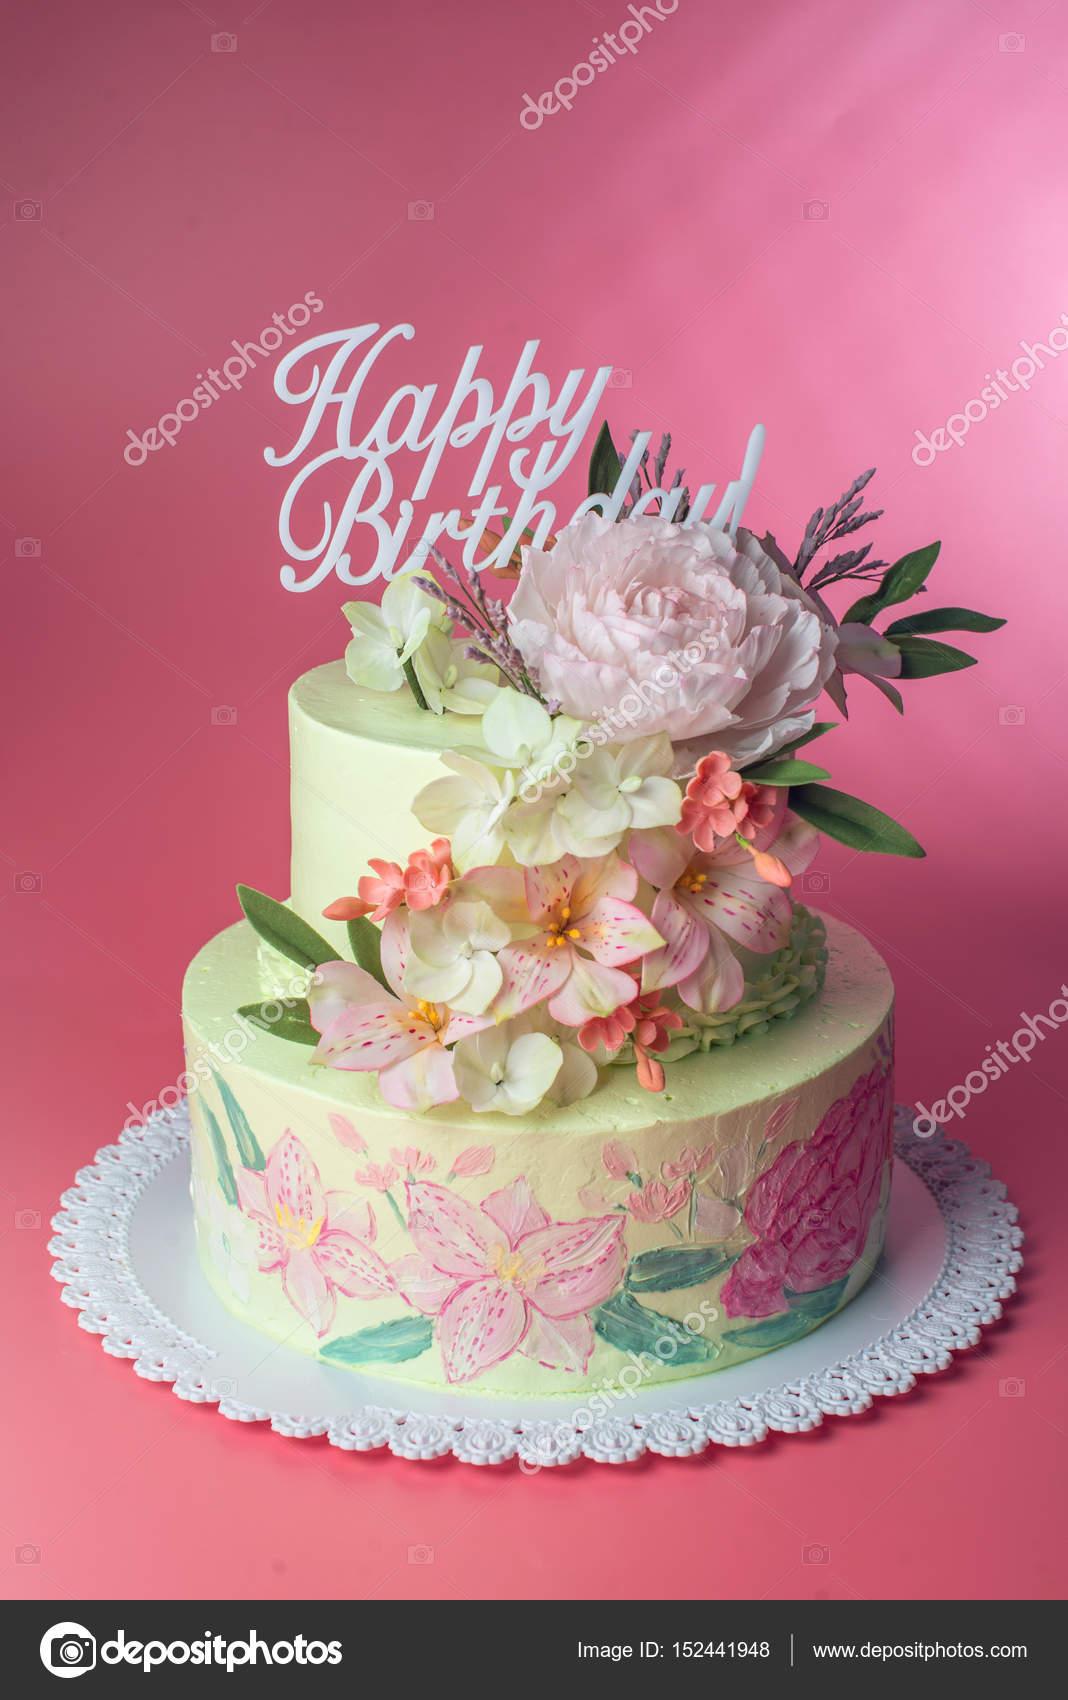 Sensational Happy Birthday Rose Cake A Beautiful Spring Two Tiered Cake Birthday Cards Printable Nowaargucafe Filternl